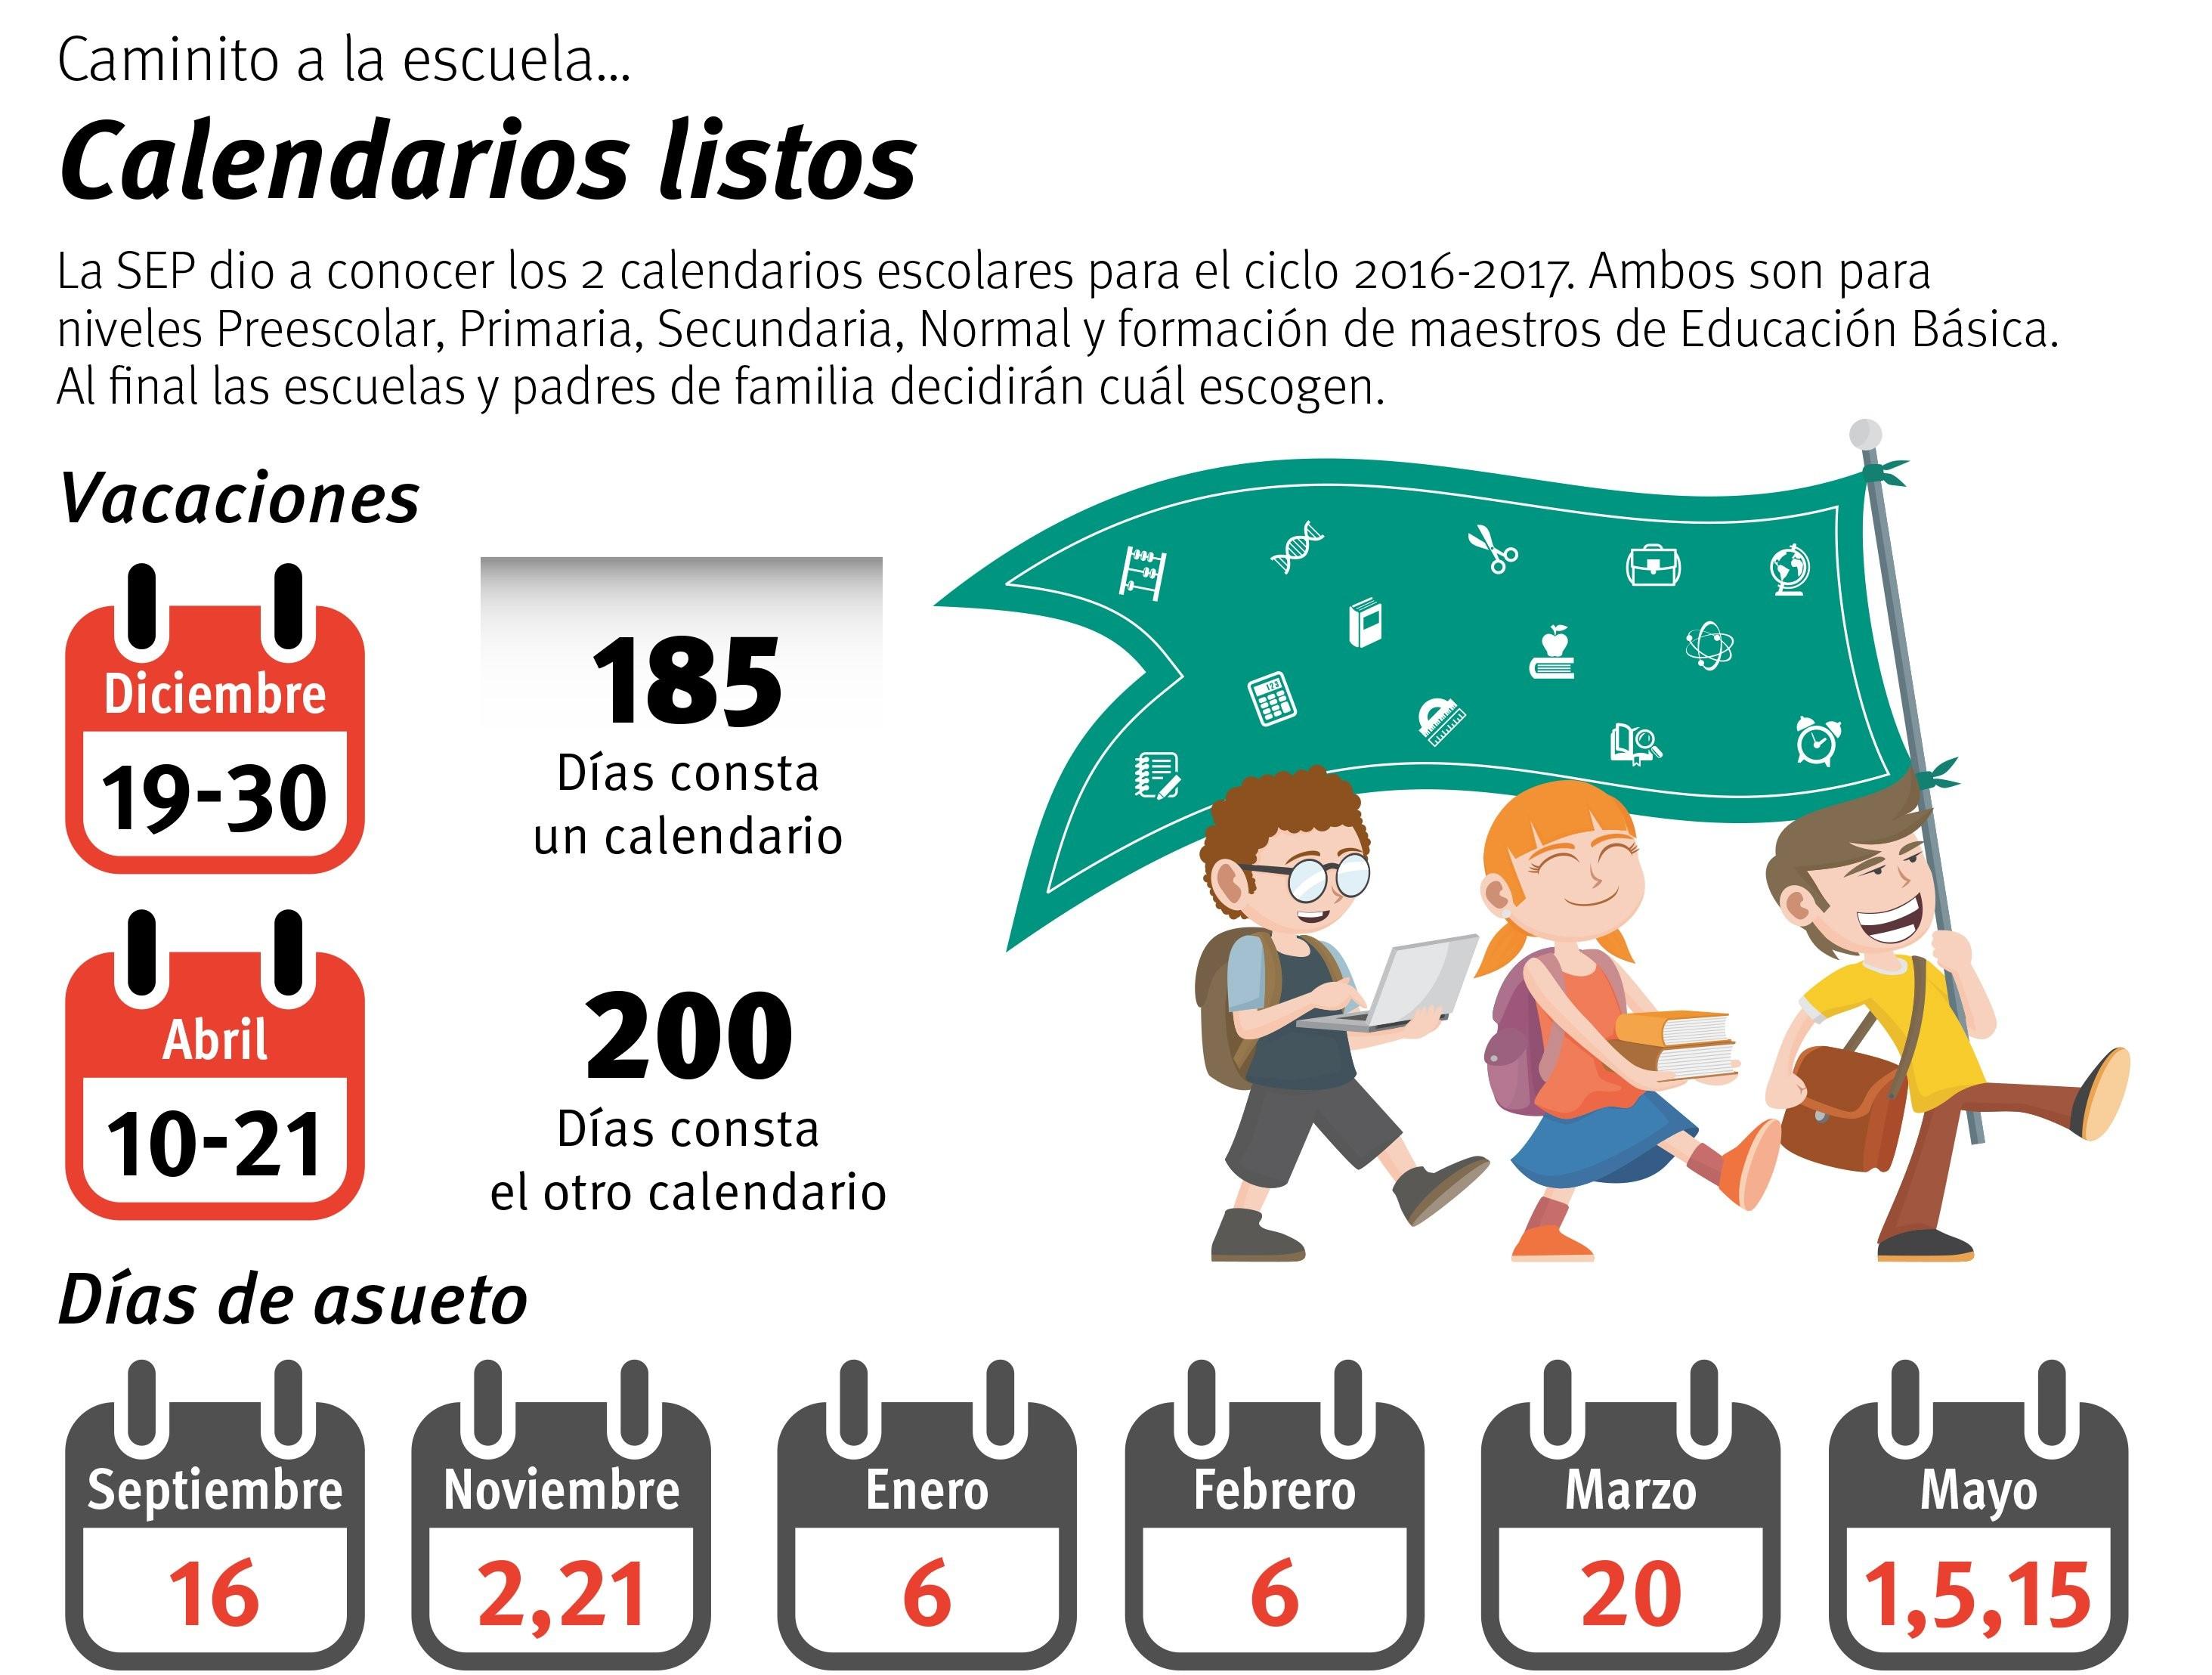 Calendario 2019 Escolar Argentina Más Arriba-a-fecha Publica La Sep 2 Calendarios Of Calendario 2019 Escolar Argentina Más Arriba-a-fecha Centro De Ense'anza Técnica Industrial